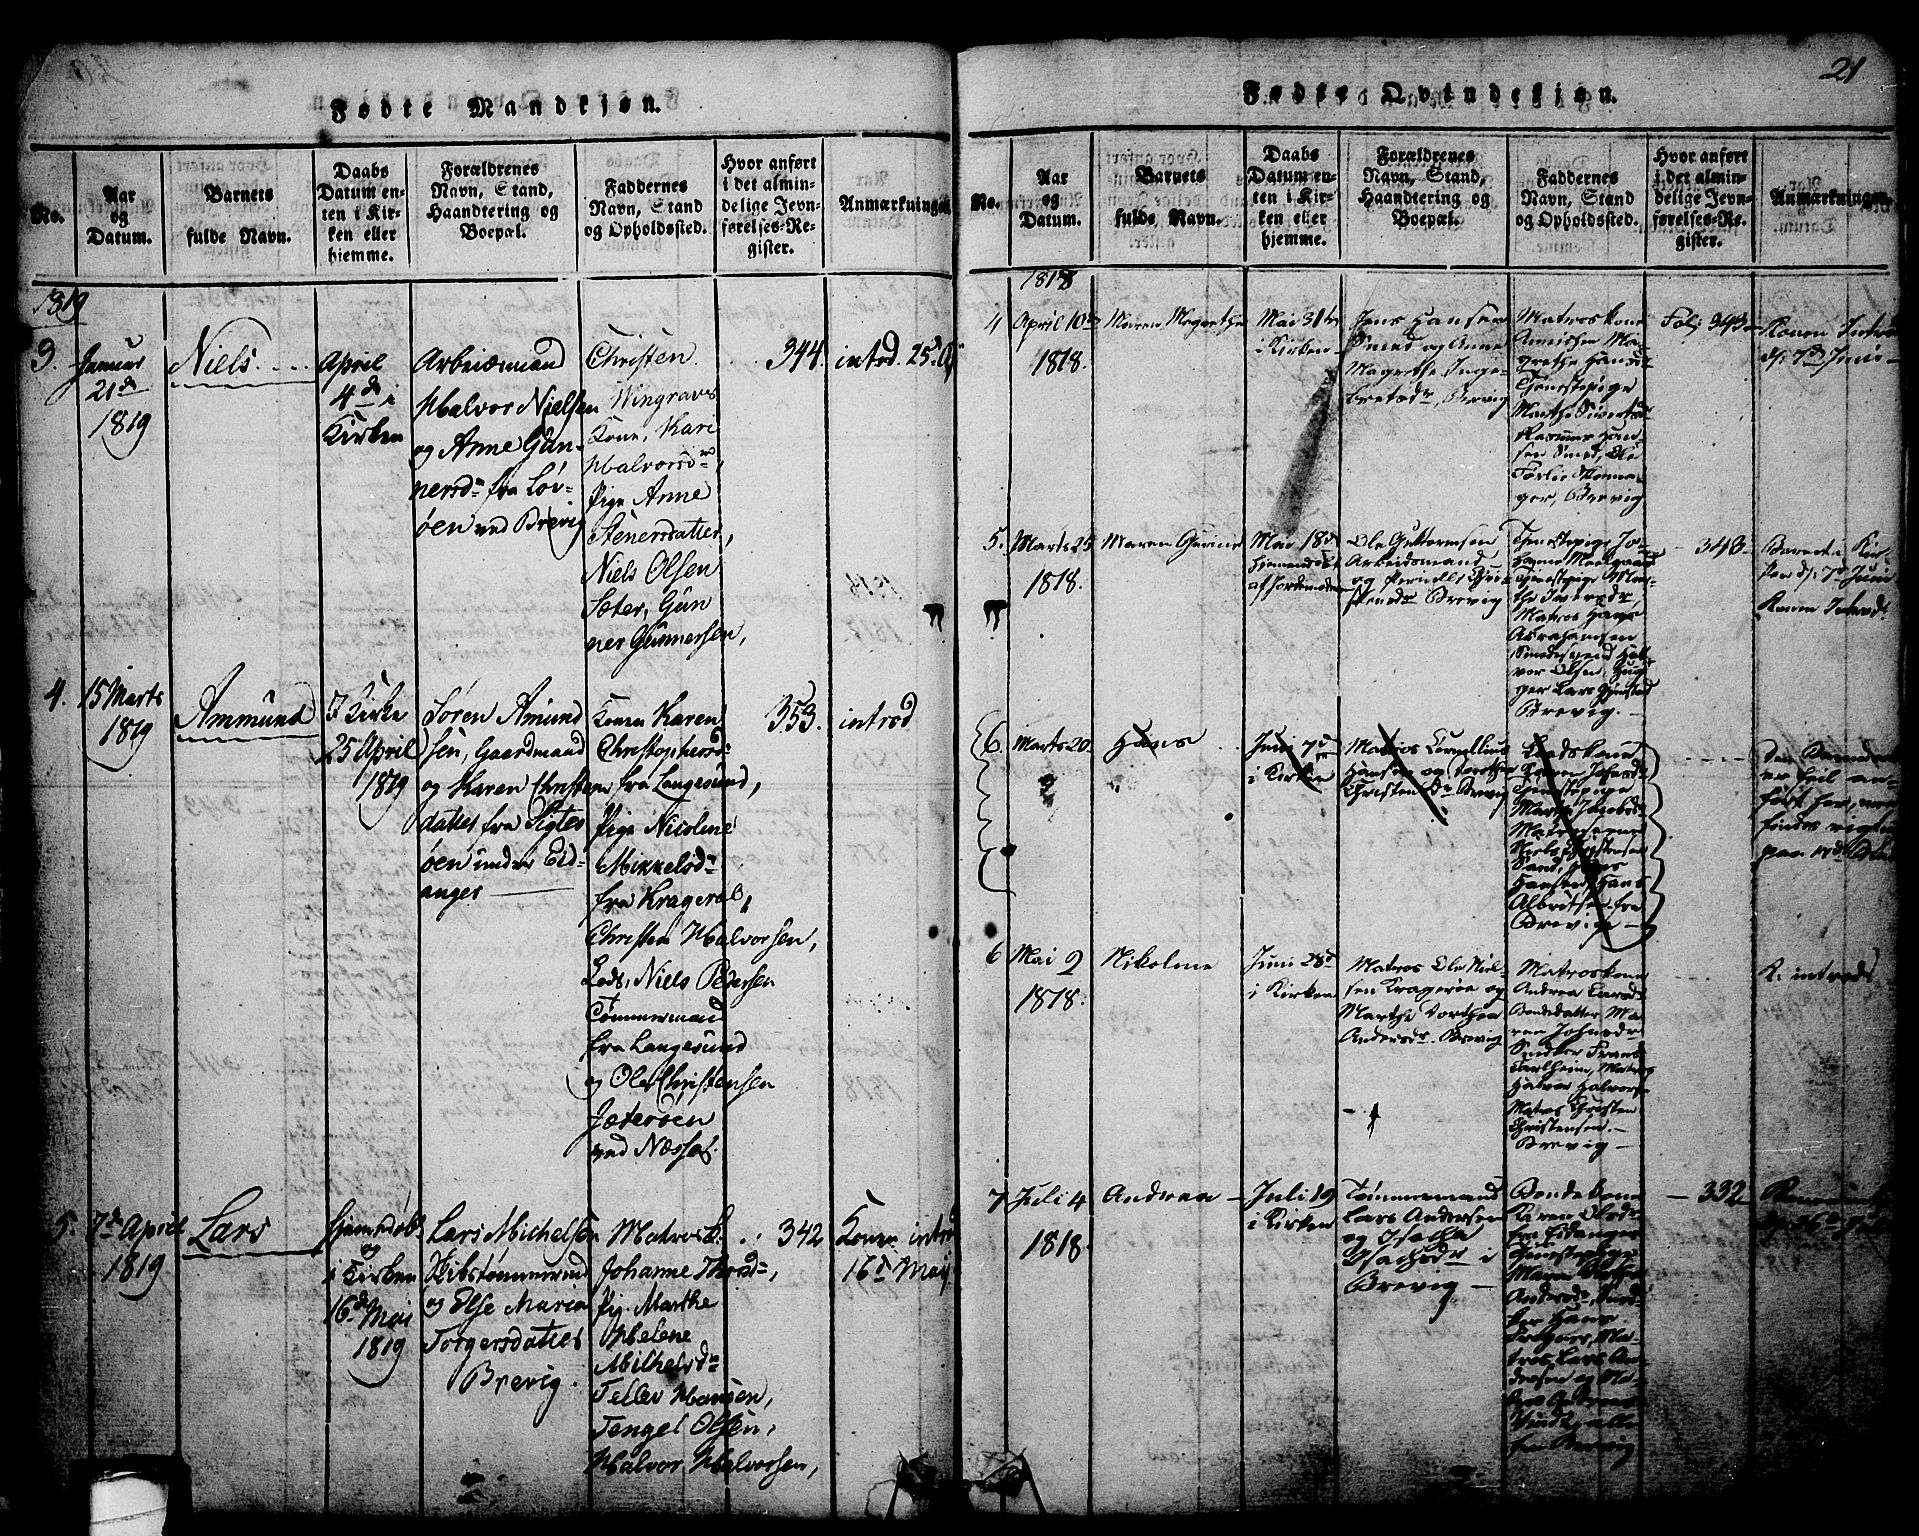 SAKO, Brevik kirkebøker, G/Ga/L0001: Klokkerbok nr. 1, 1814-1845, s. 21